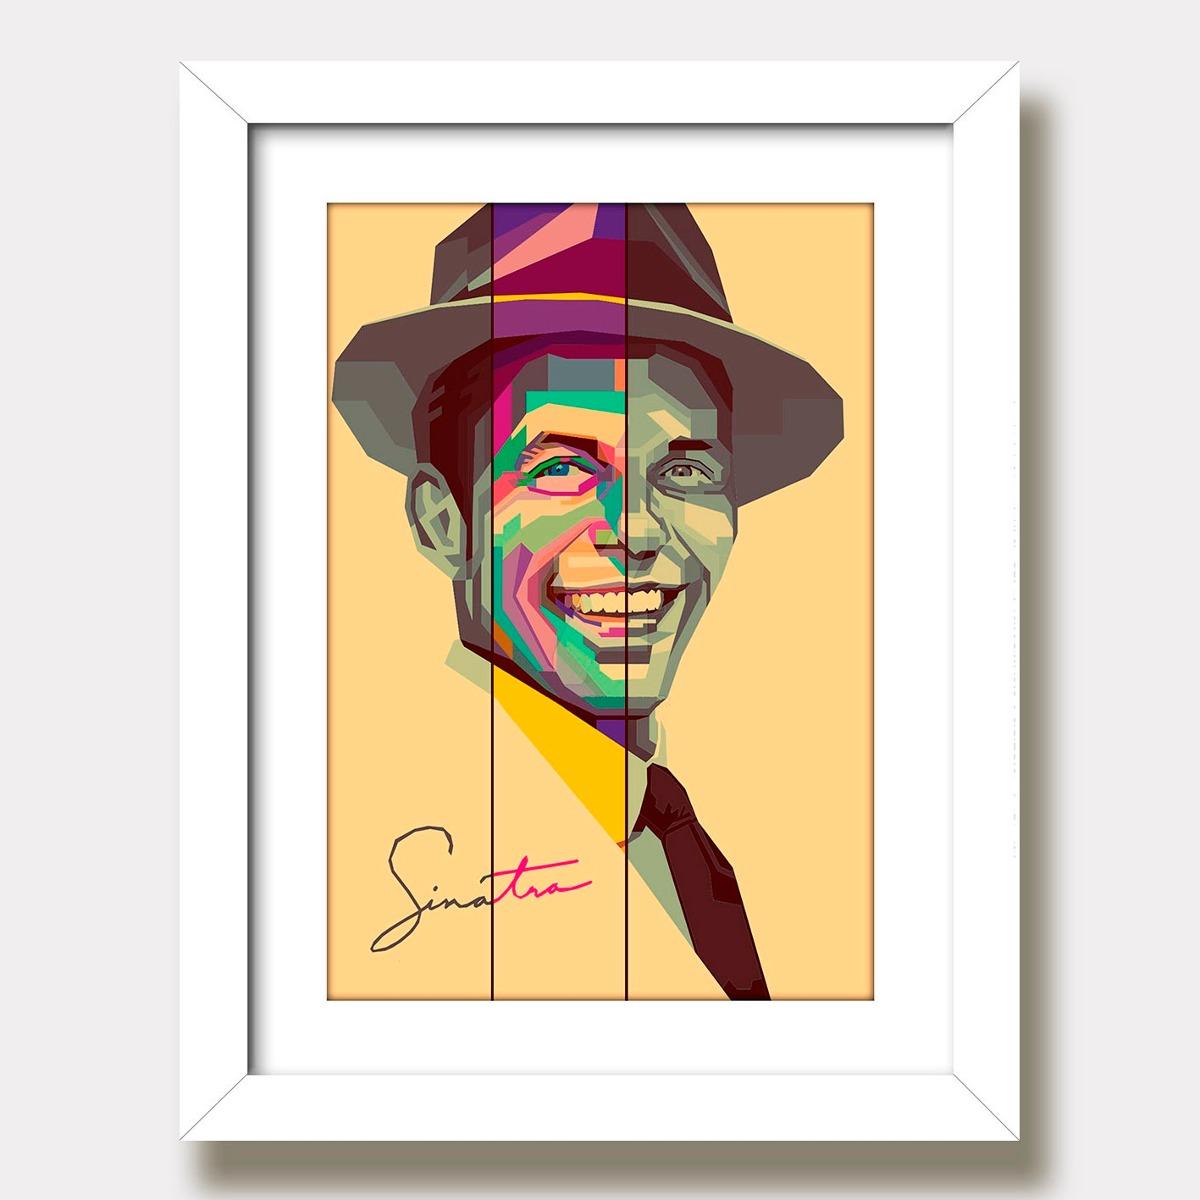 ca8c38cf1071d Quadro Frank Sinatra Musica Jazz Decorativo Pop Art Paspa Kp - R  135